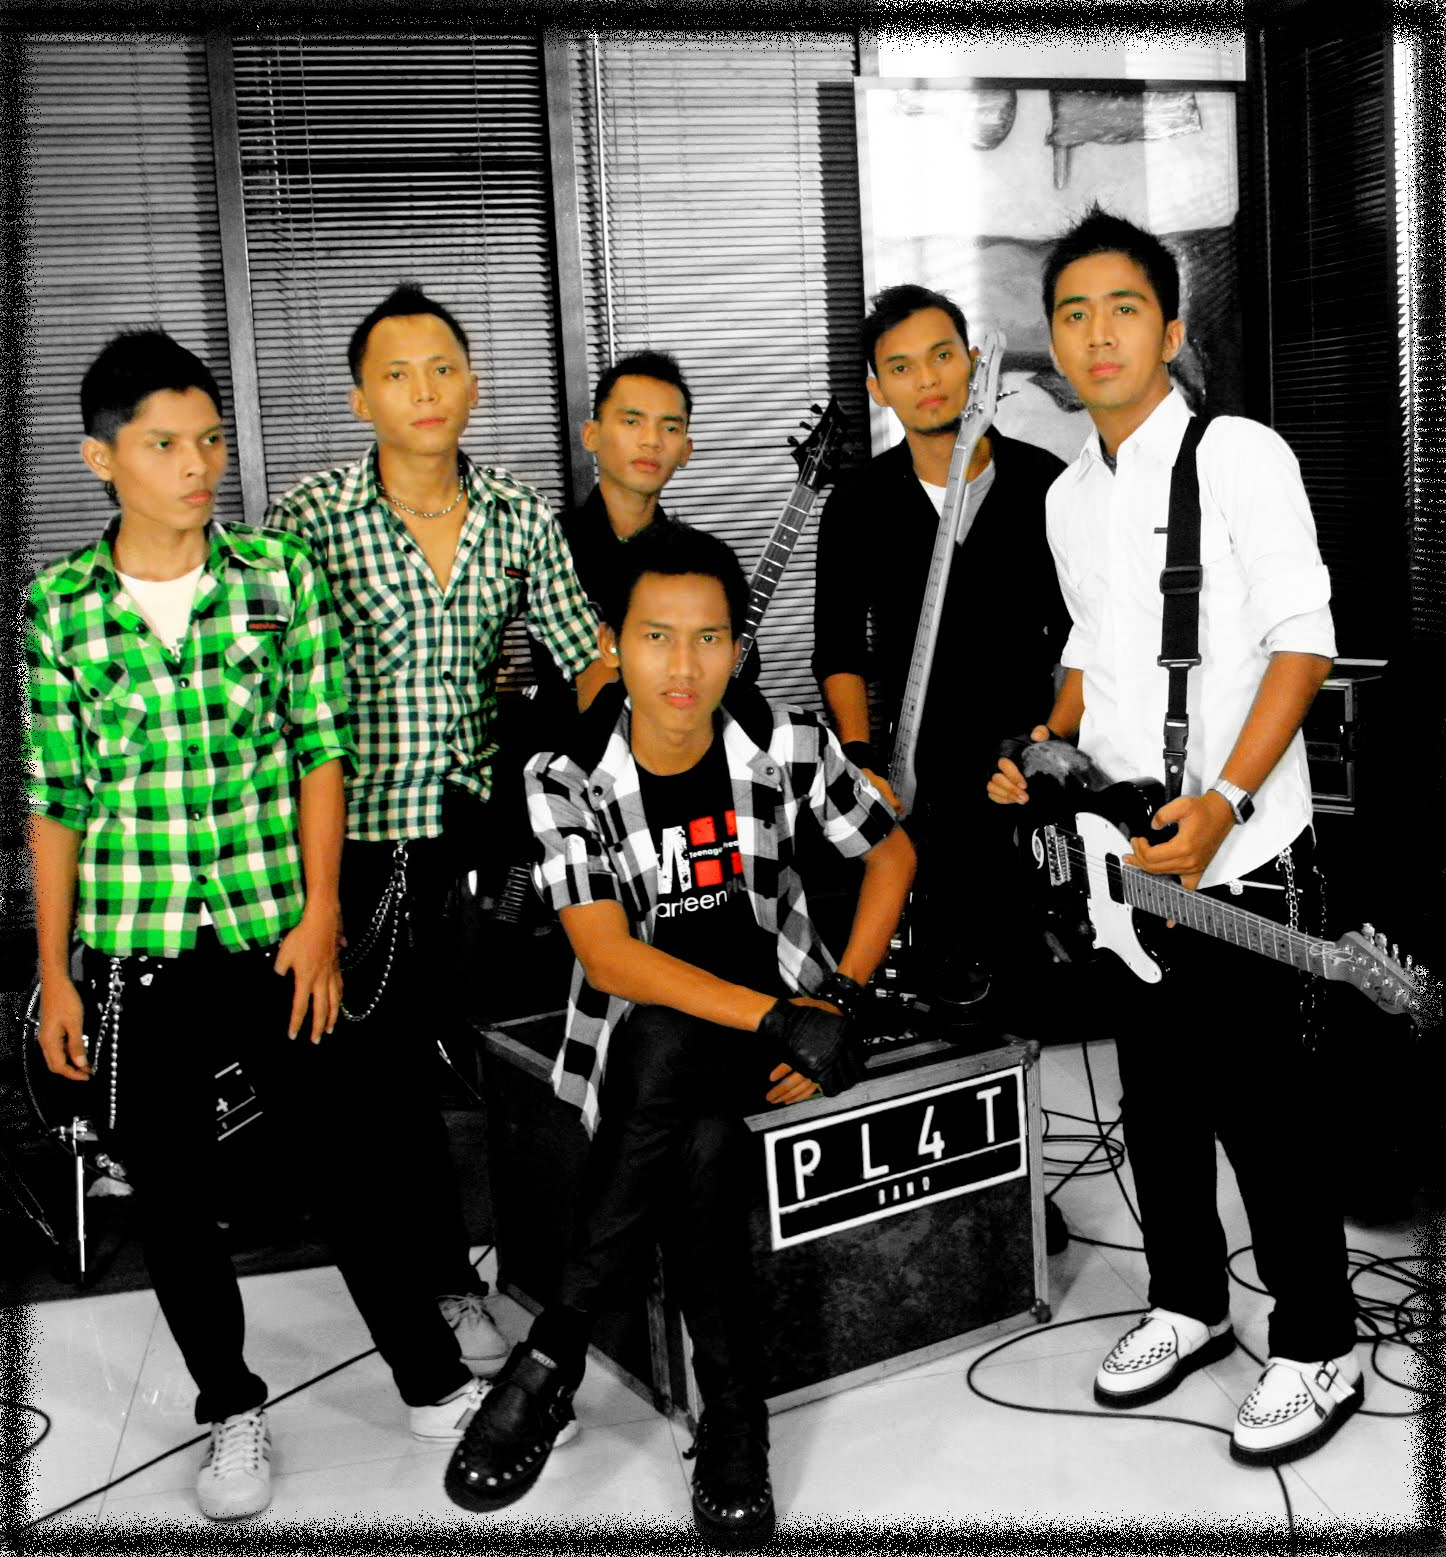 Lirik Chord Gitar Nidji: Chord Lagu Awal Dari Cinta Chord Awal Dari Cinta